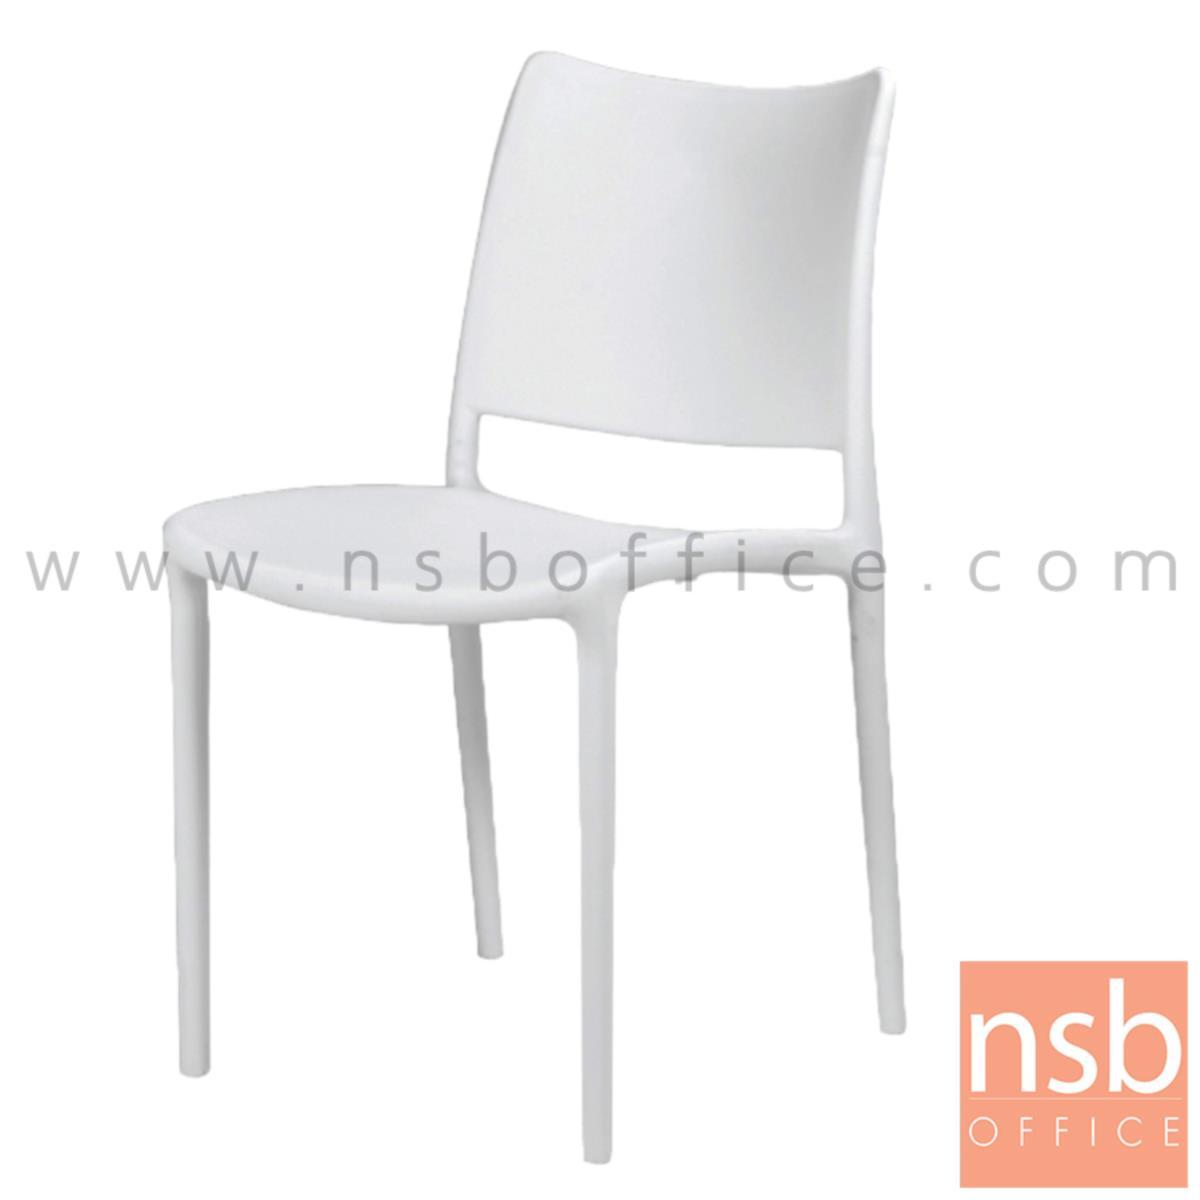 B29A060:เก้าอี้โมเดิร์นพลาสติกโพลี่(PP)ล้วน รุ่น PP9225 ขนาด 44W cm.